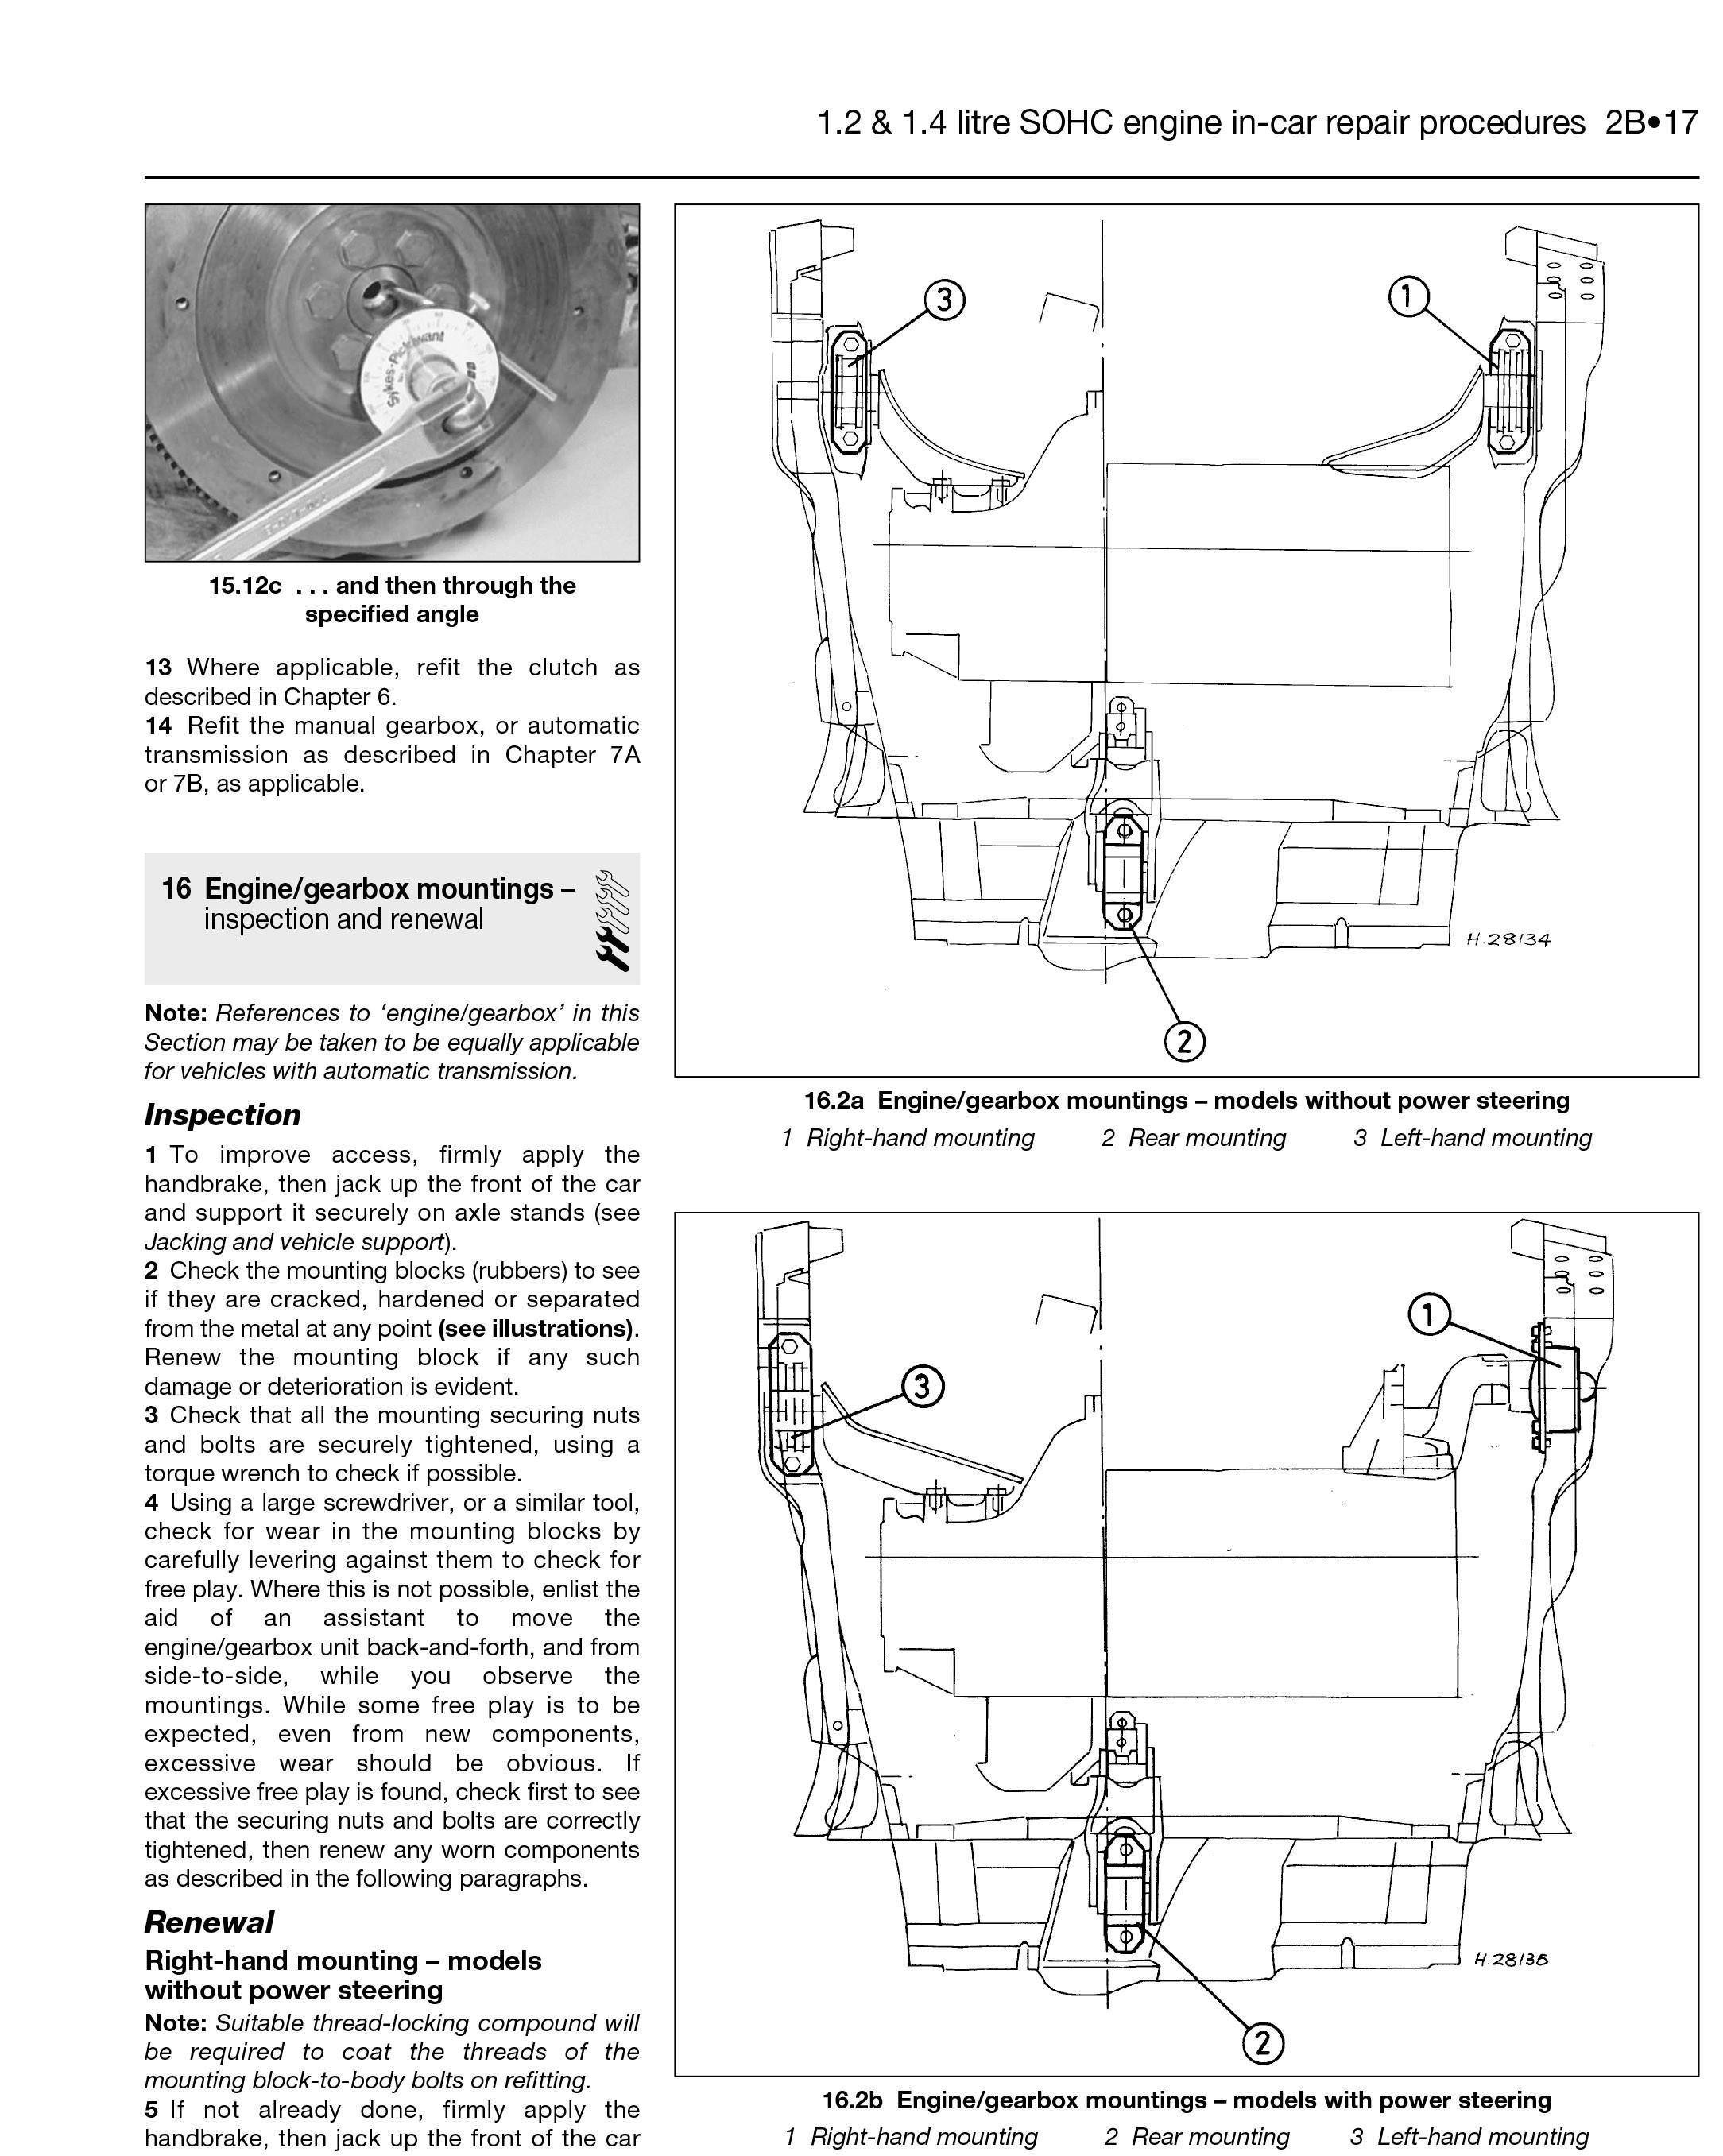 Vauxhall Corsa 1 2 Engine Diagram Vauxhall Corsa 1 2 Engine Diagram Diagram Chart Gallery Of Vauxhall Corsa 1 2 Engine Diagram